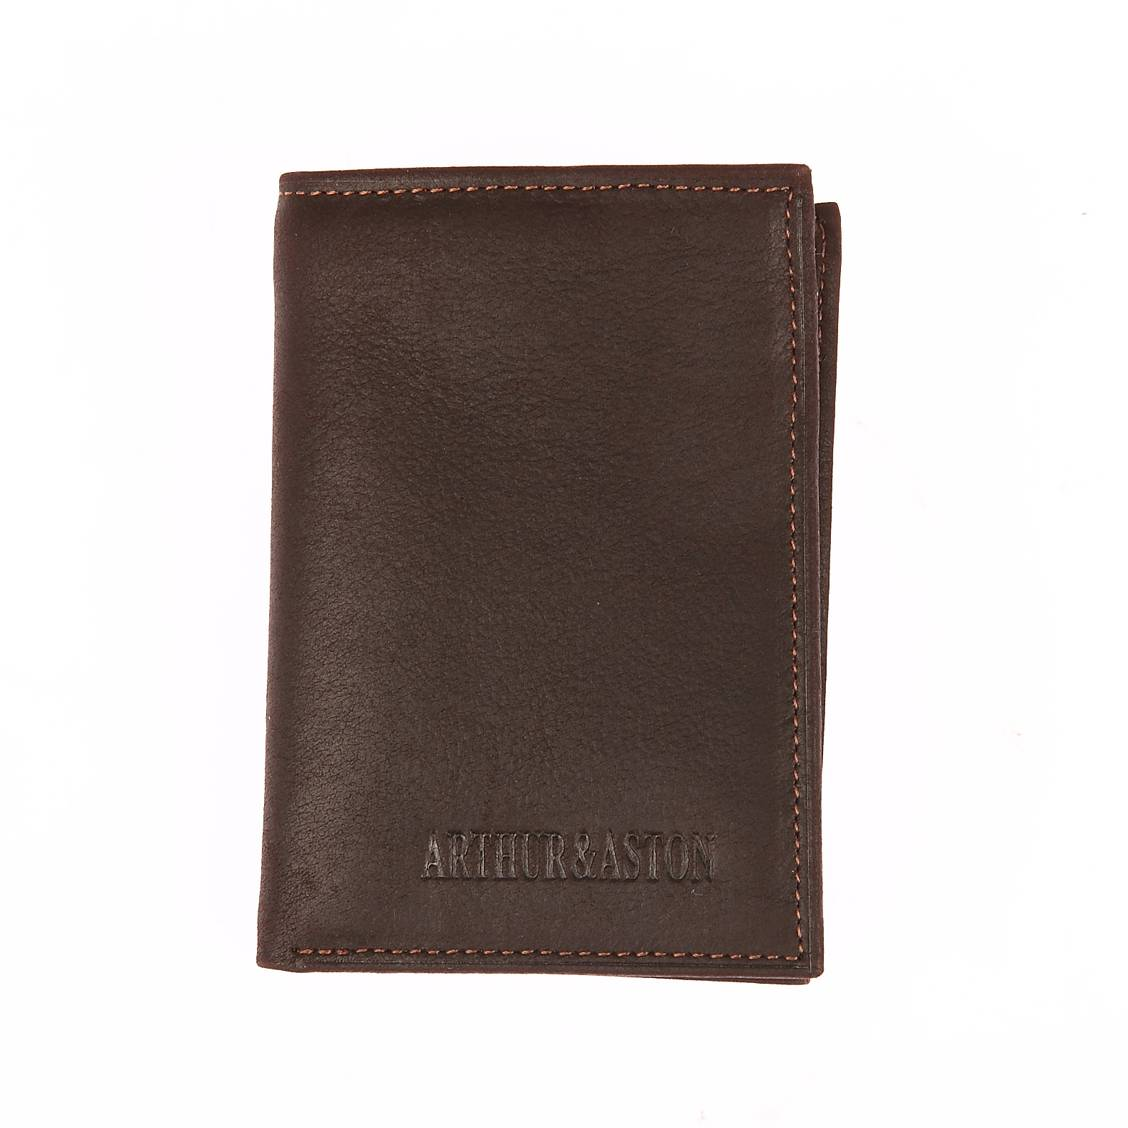 Porte-cartes 2 volets arthur & aston en cuir gras marron